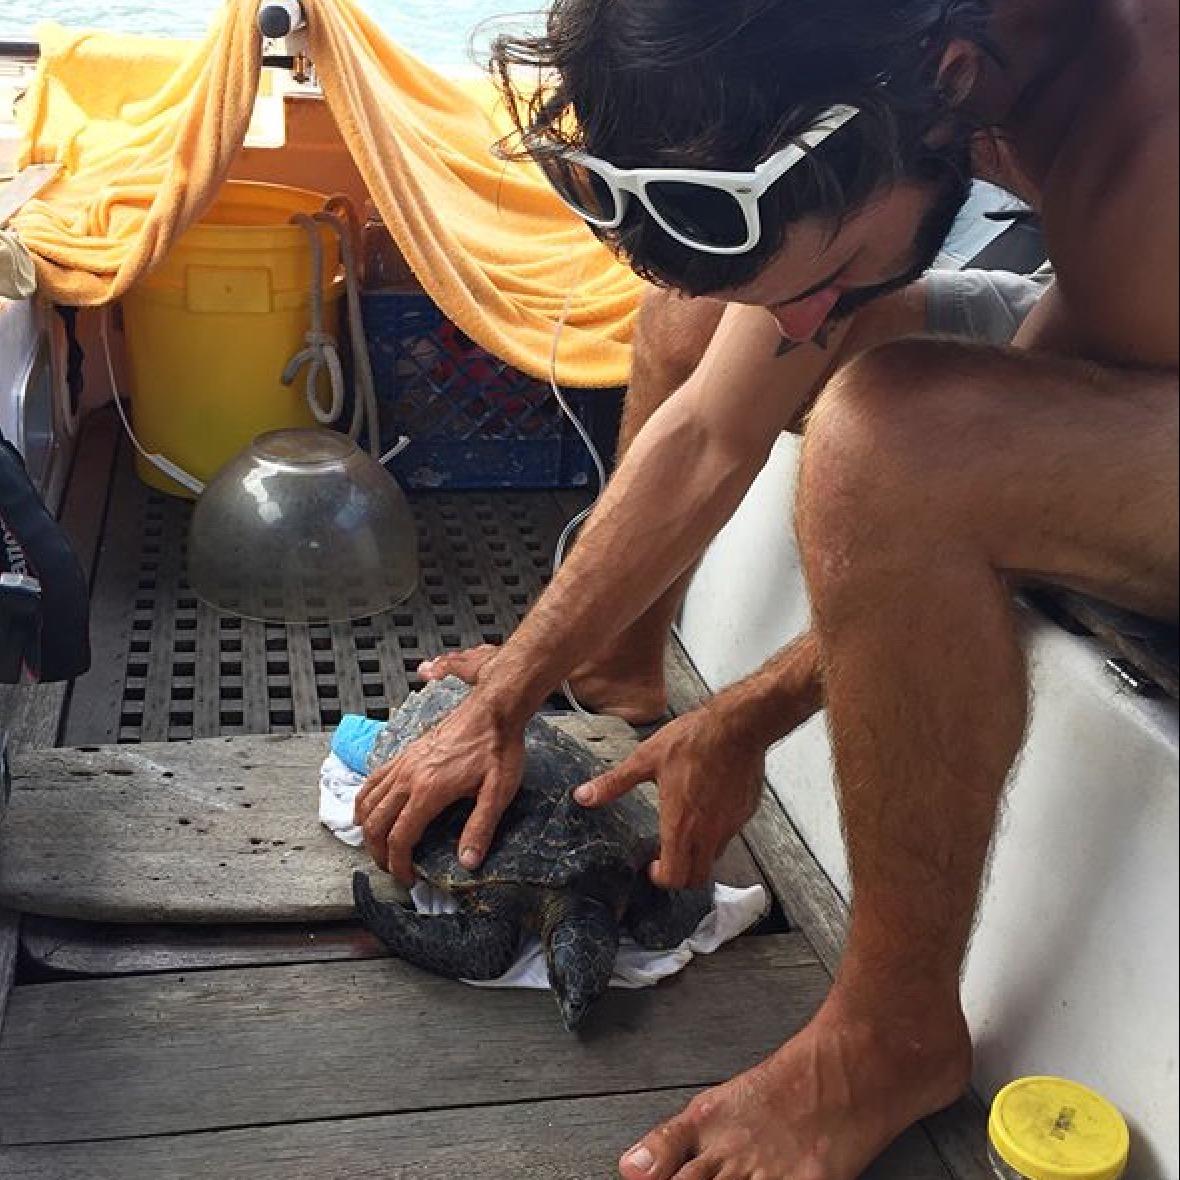 Billie recieving fluids on board